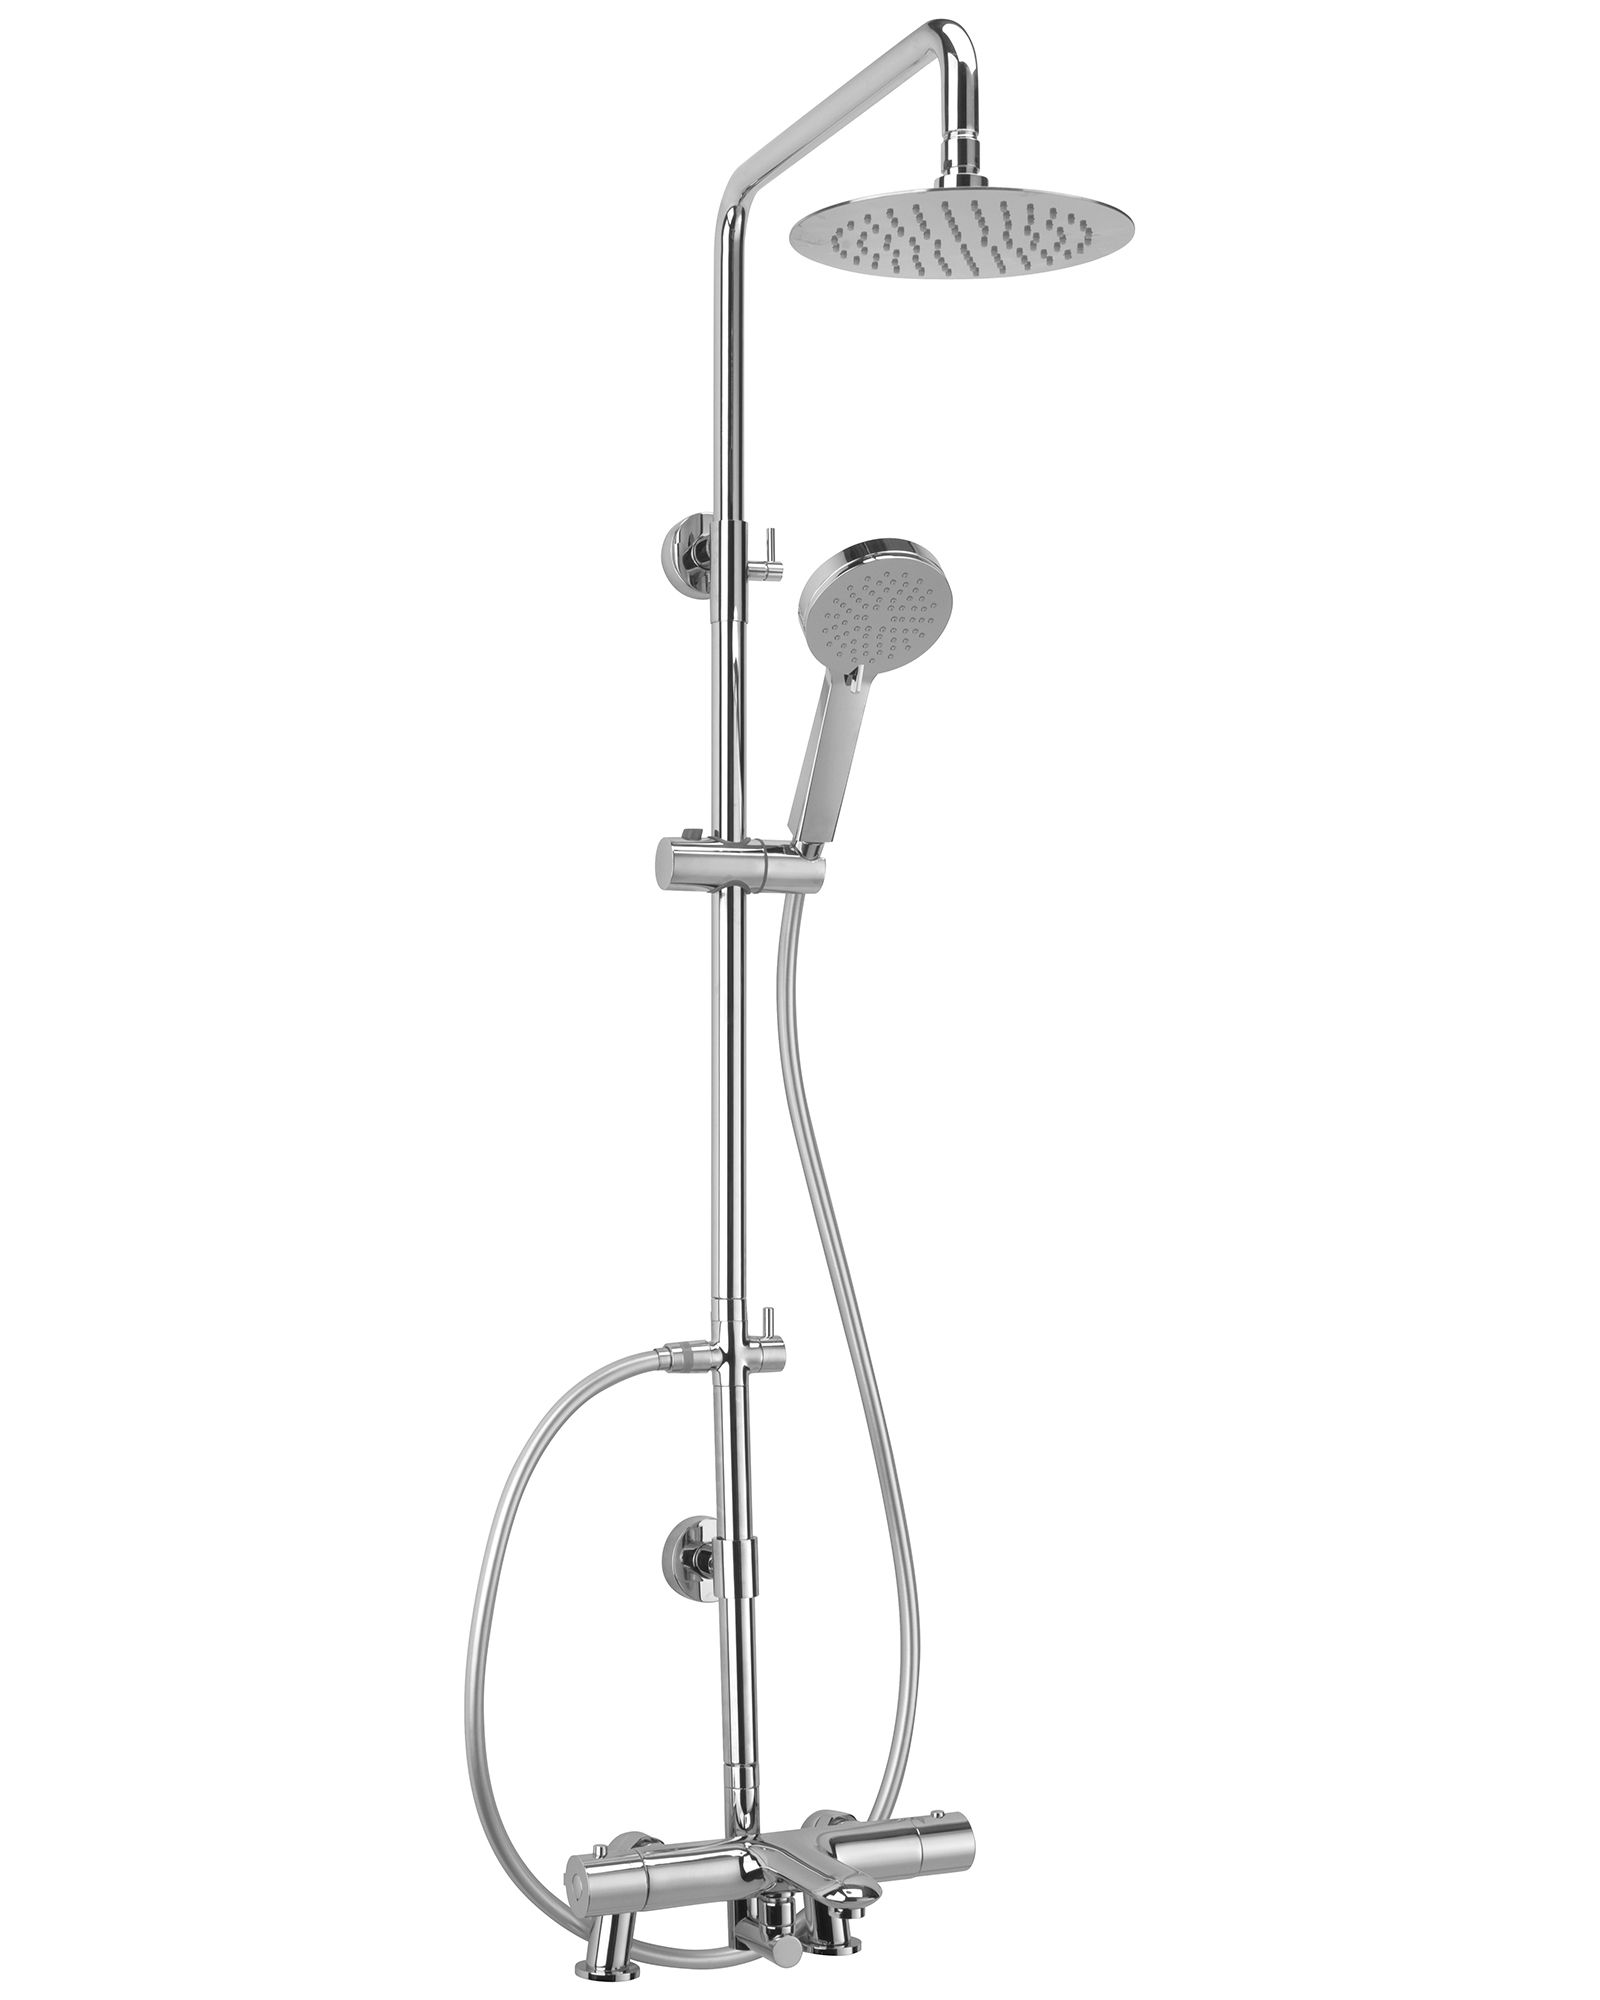 Sagittarius Logic Deck Mounted Bath Shower Mixer And Rigid Riser Kit Shower Bath Bathroom Shower